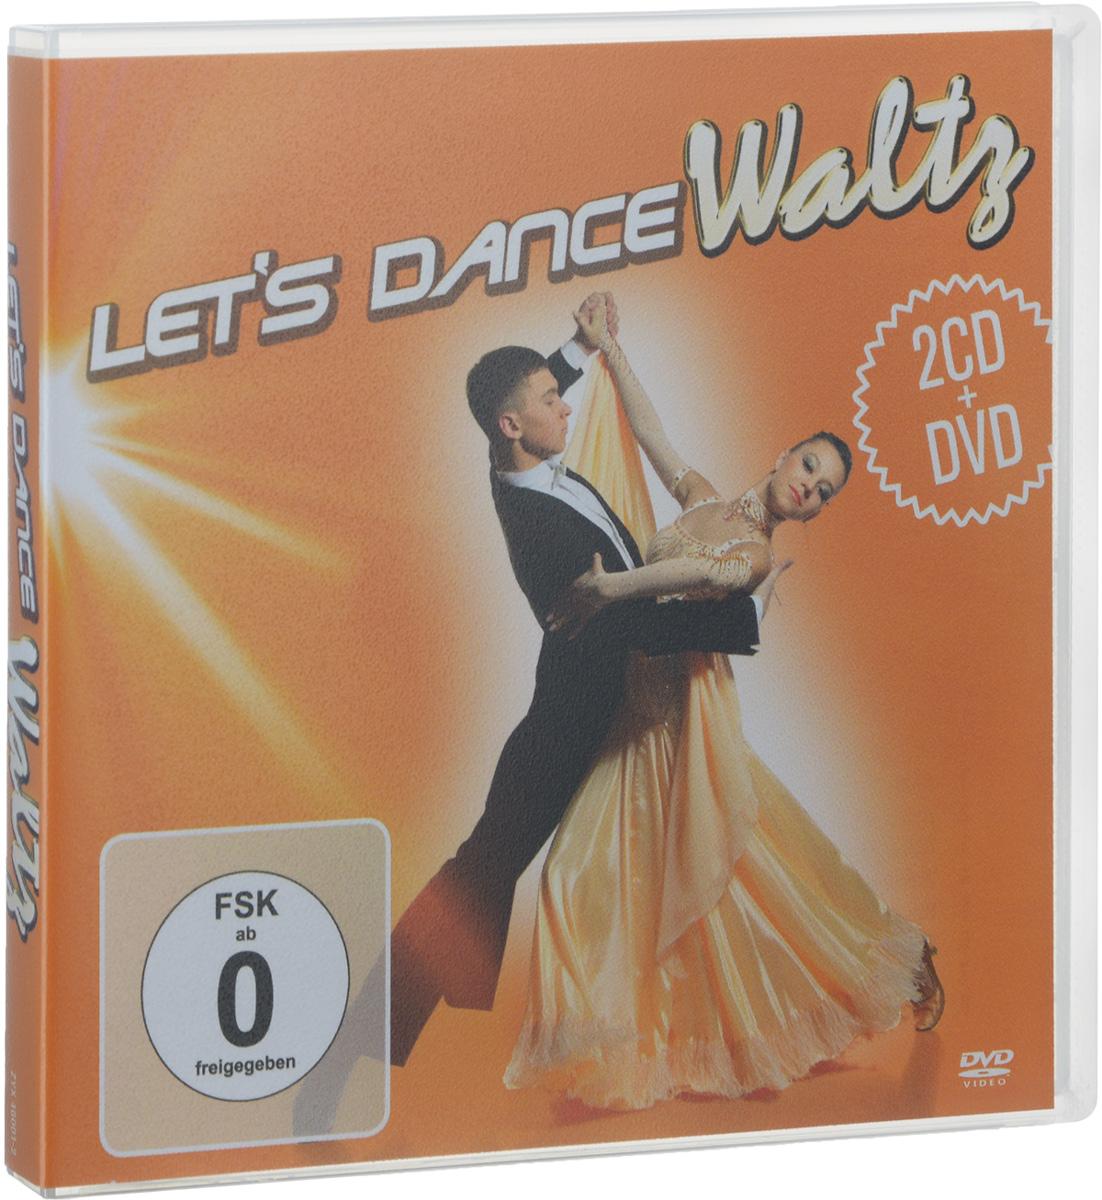 Let's Dance. Waltz (2 CD + DVD) 2014 3 CD + DVD